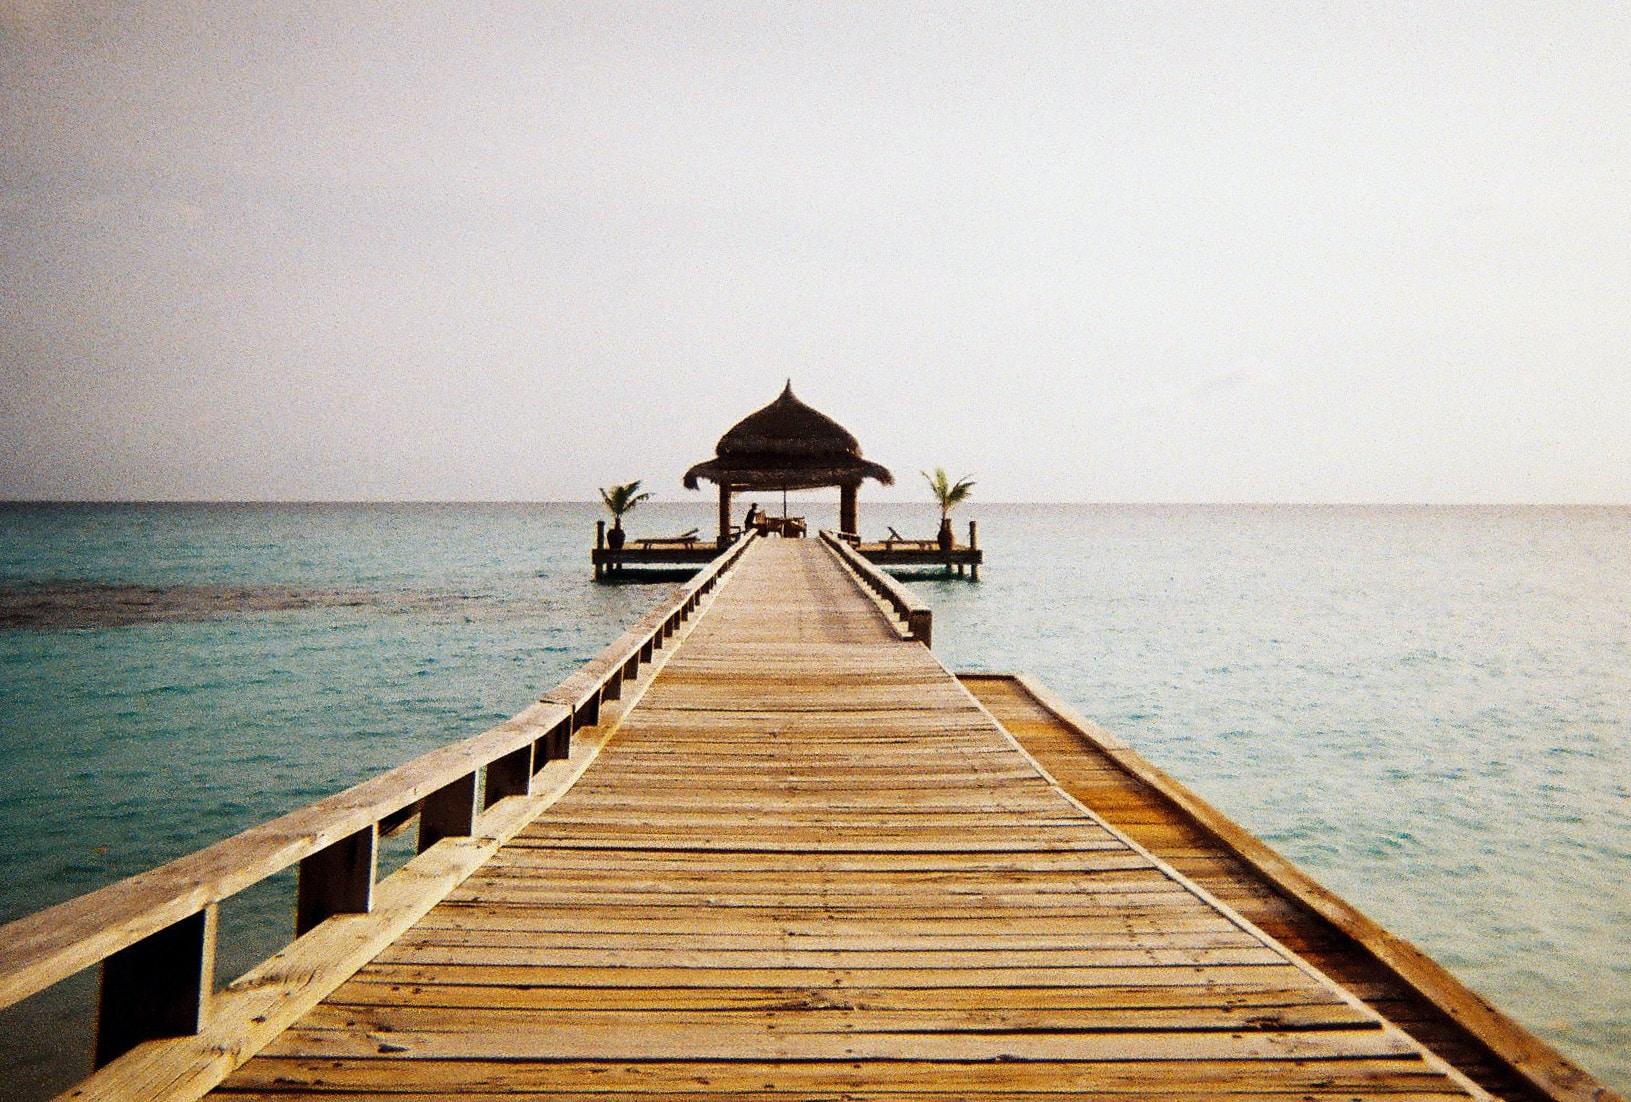 brown wooden walkway on body of water